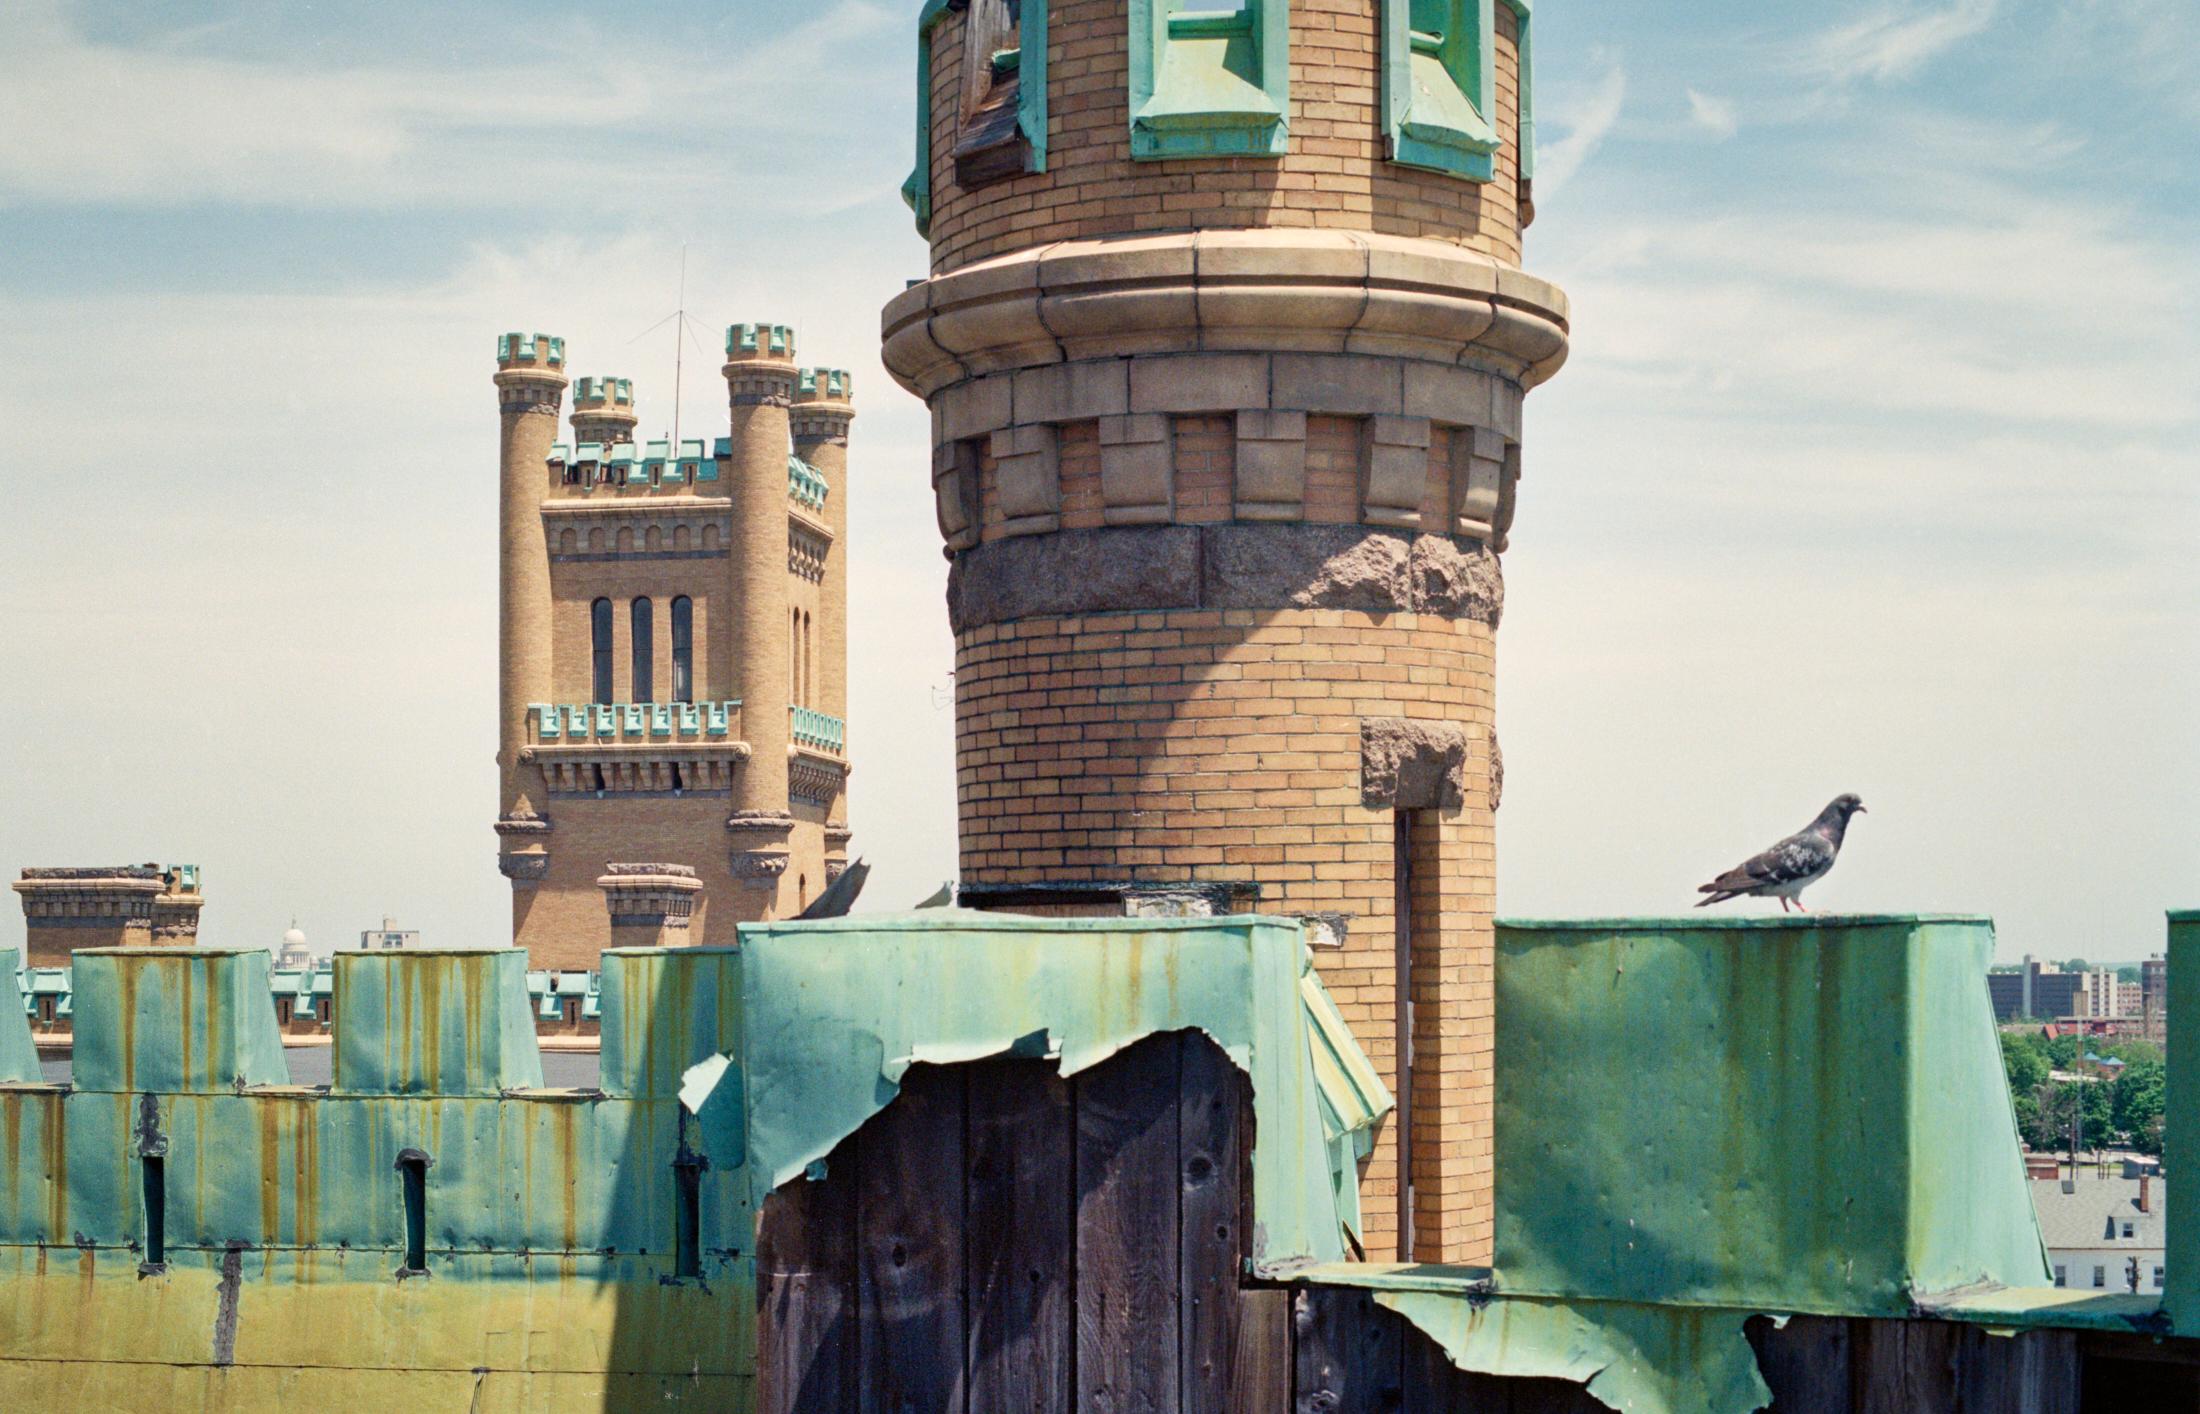 Armory_Roof_FujiG100_35_ 001